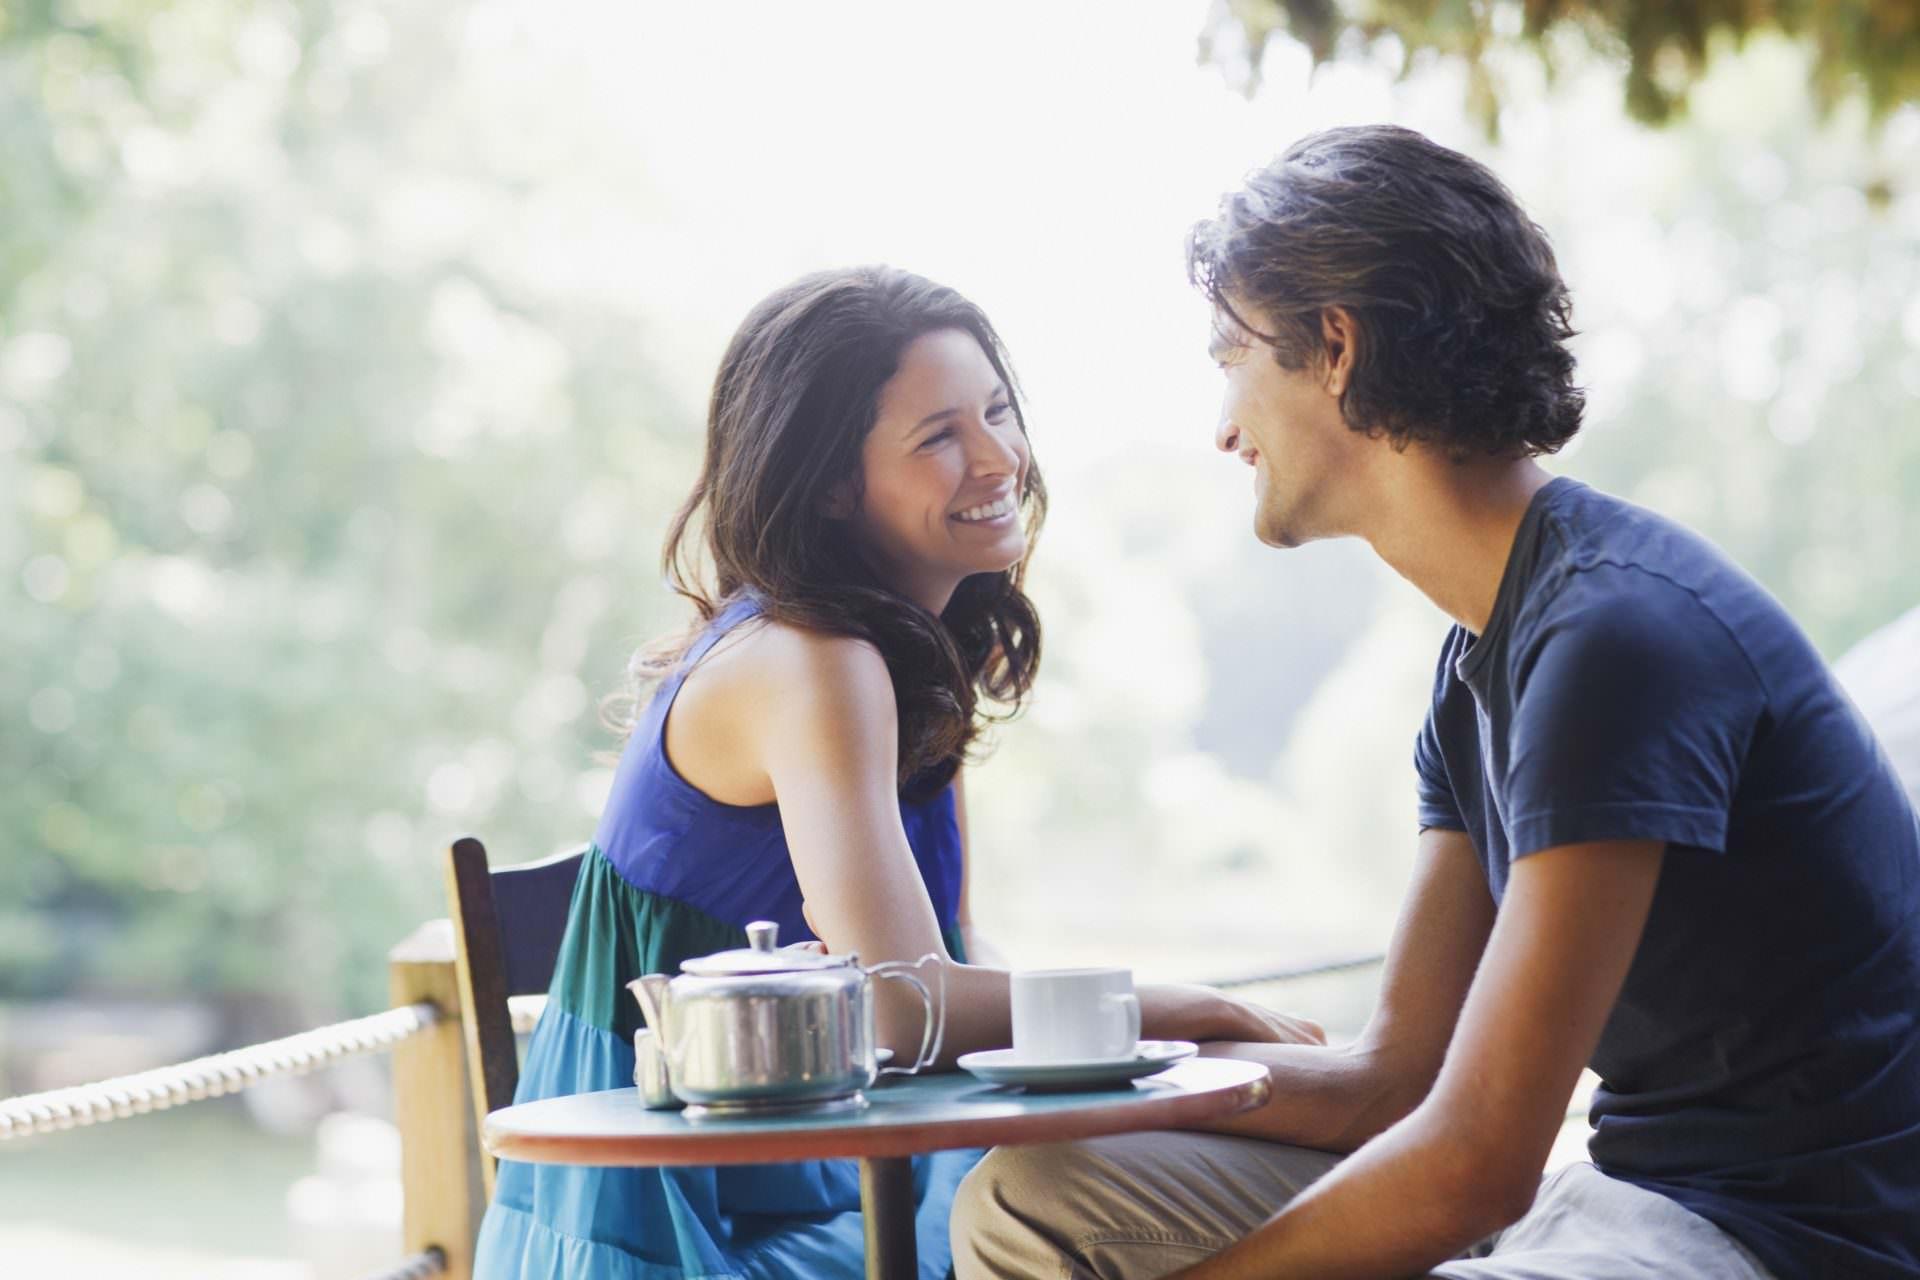 Smiling couple having tea outdoors